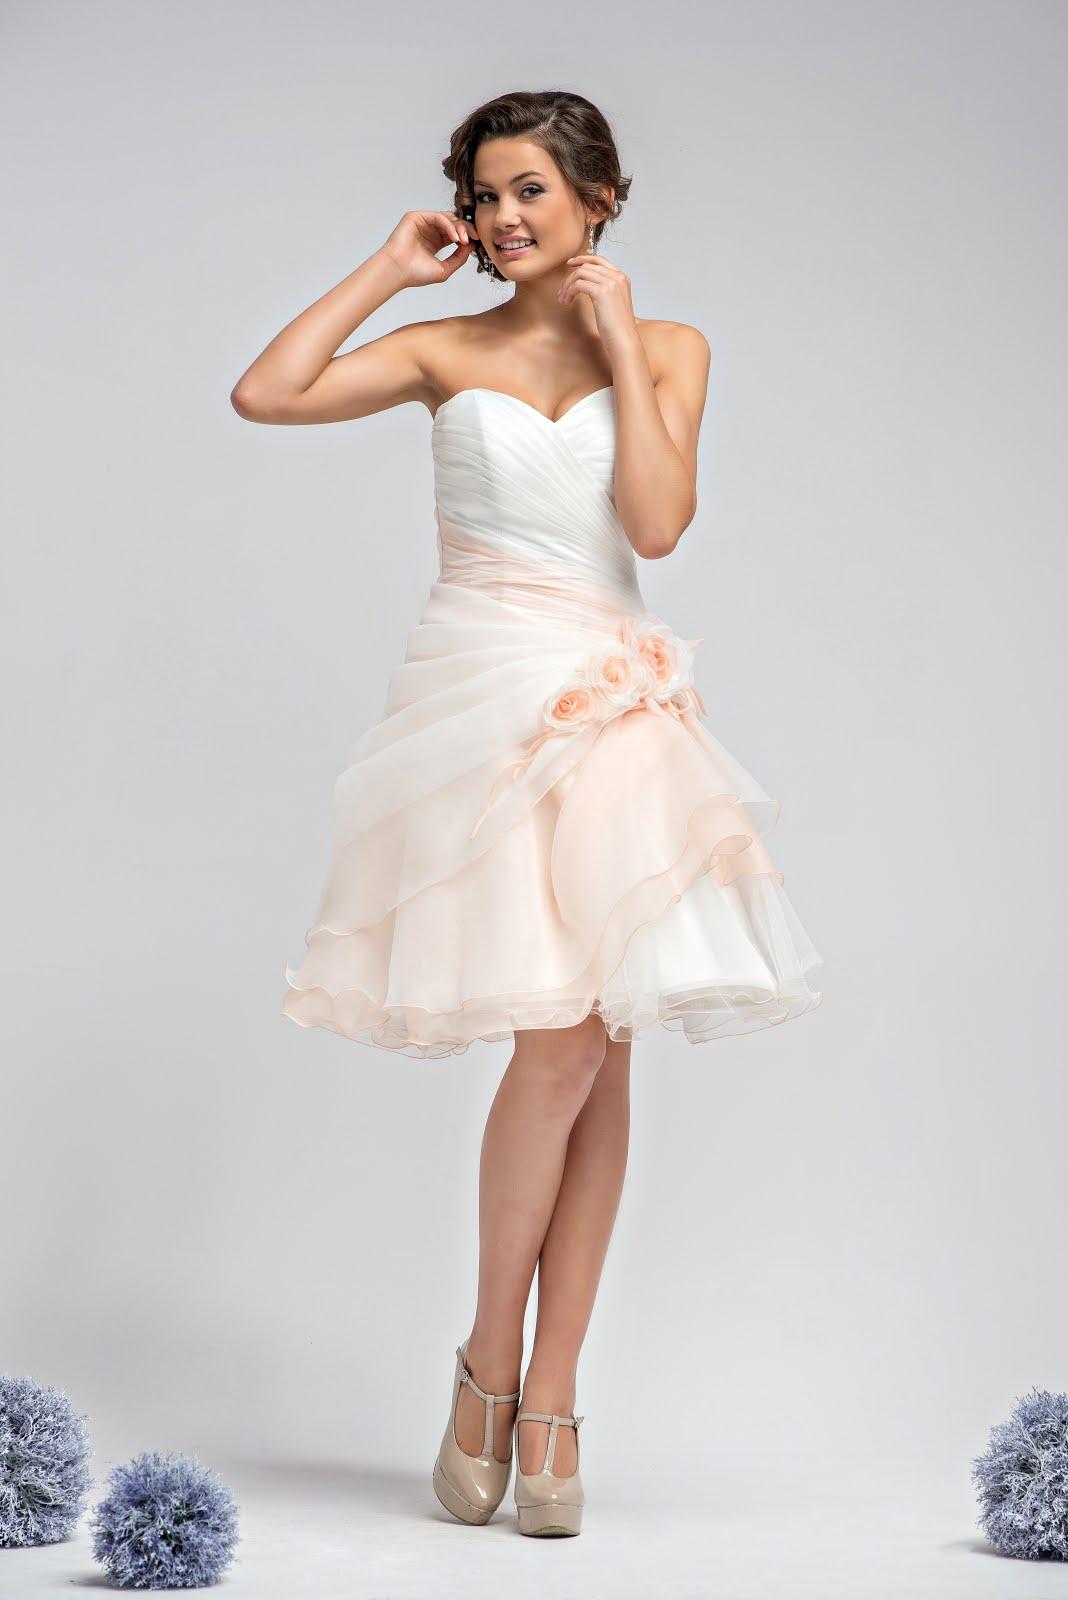 standesamtkleid rosa wei kurz drapiert kleiderfreuden. Black Bedroom Furniture Sets. Home Design Ideas